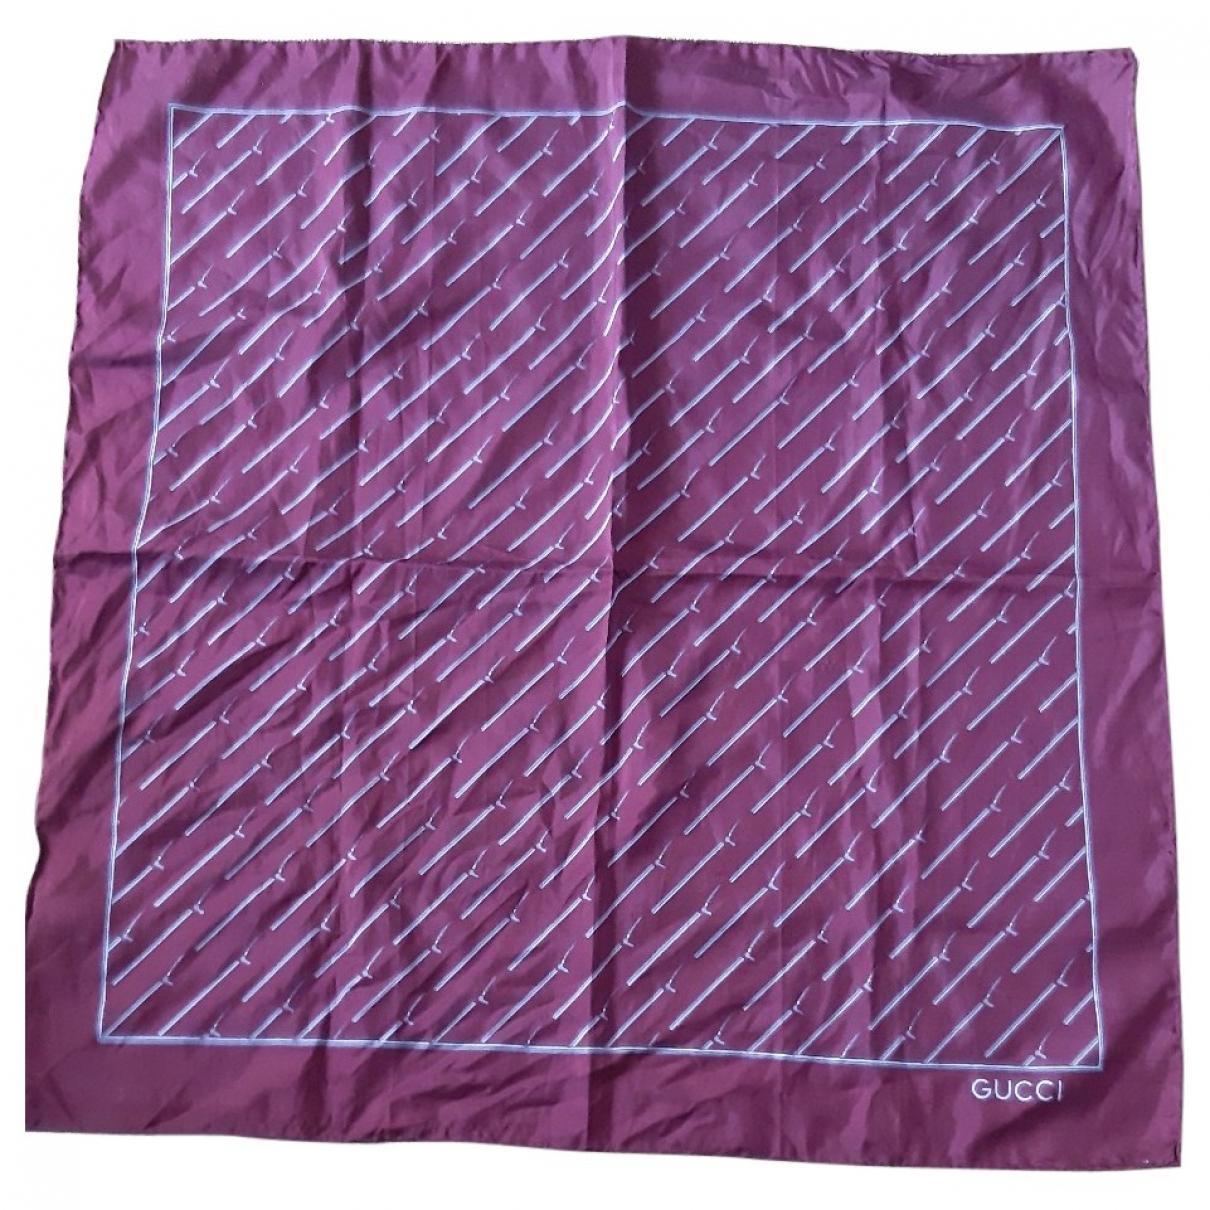 Gucci \N Burgundy Silk scarf & pocket squares for Men \N